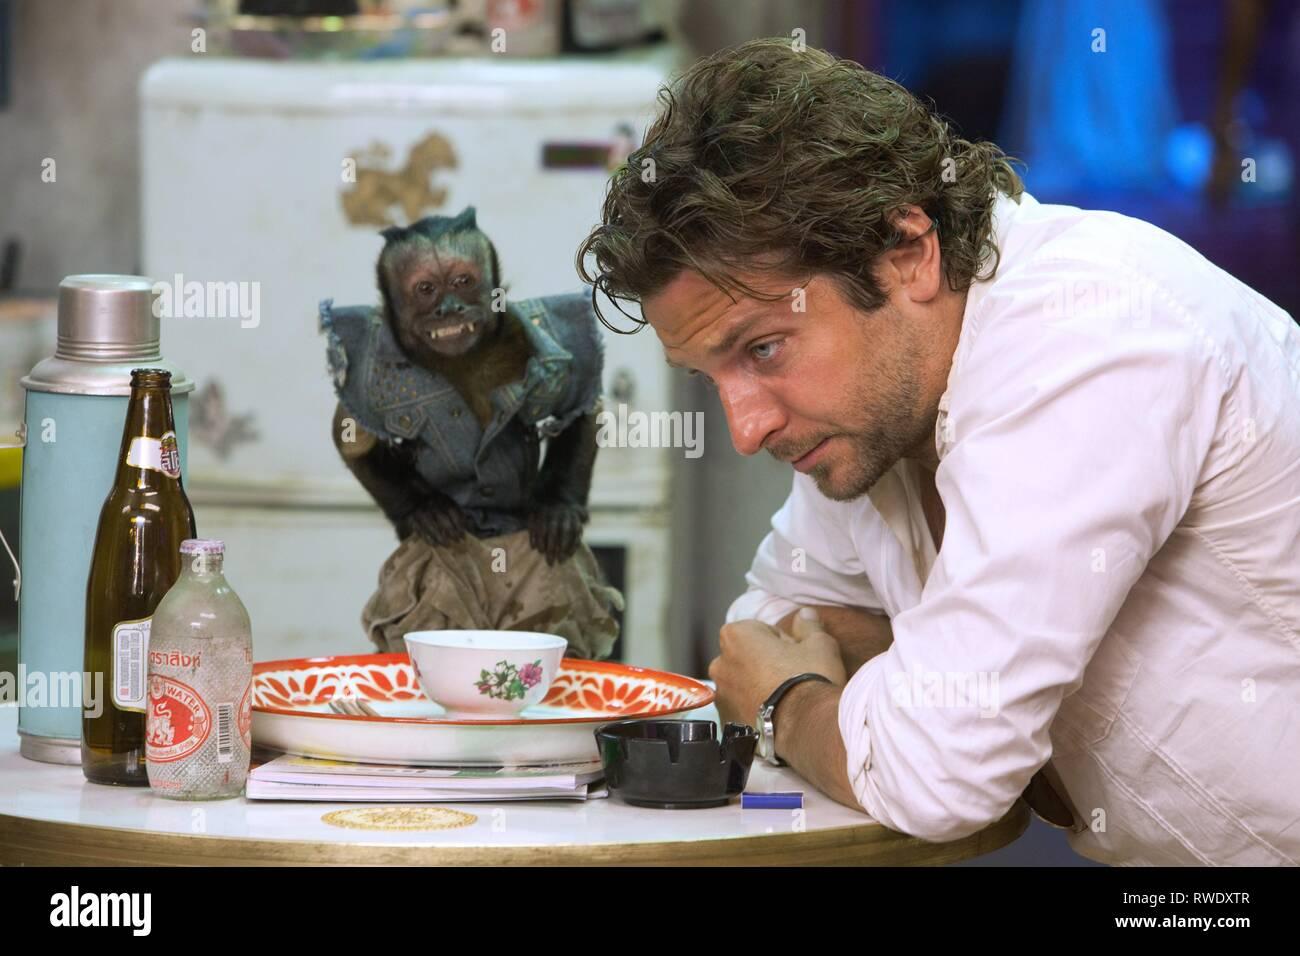 Bradley Cooper The Hangover Part Ii 2011 Stock Photo Alamy